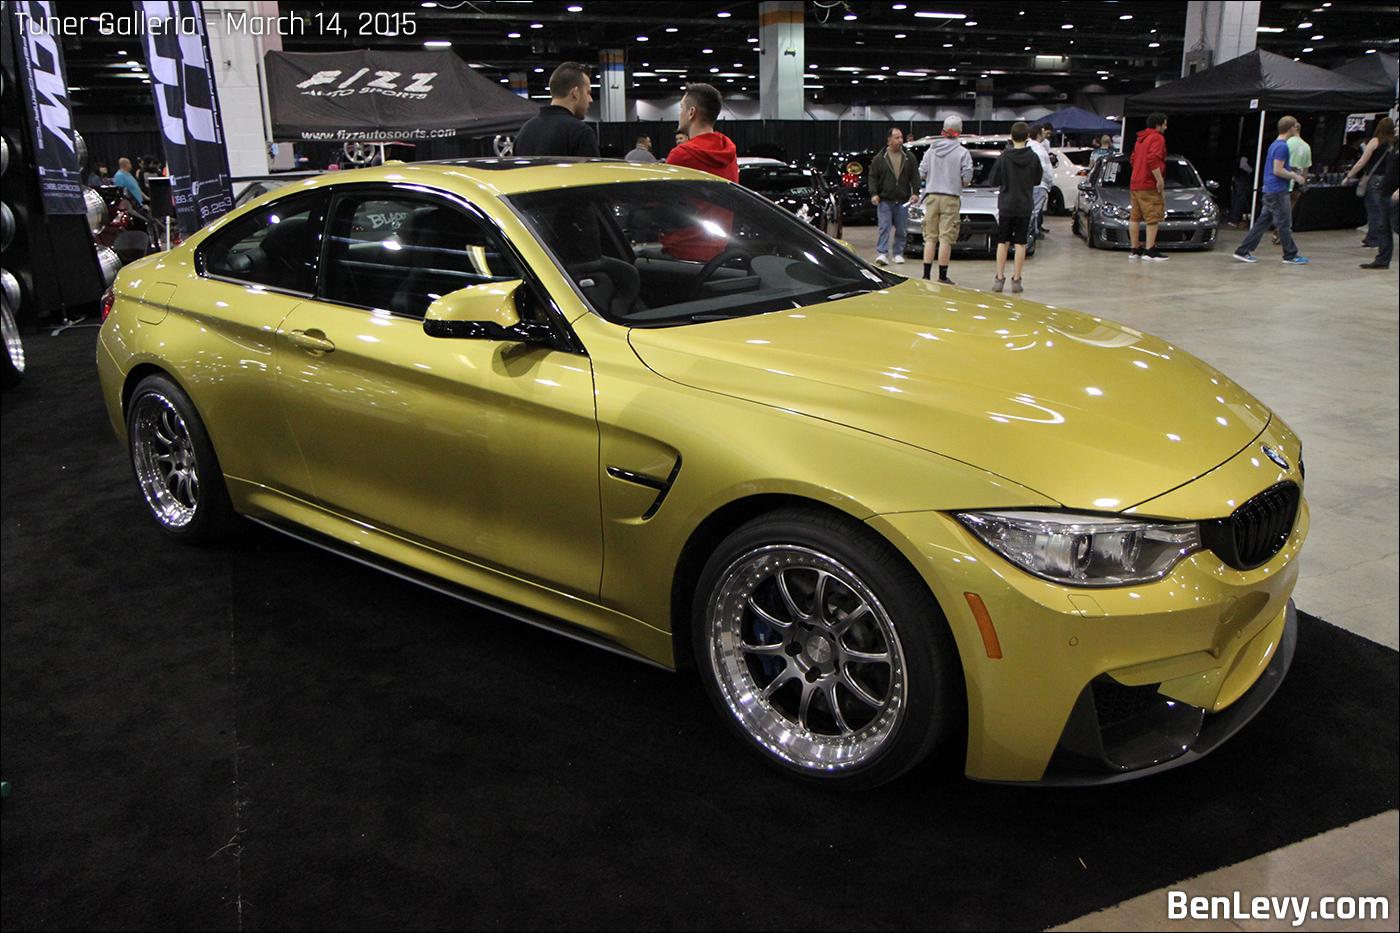 Austin Yellow Metallic Bmw M4 Benlevy Com